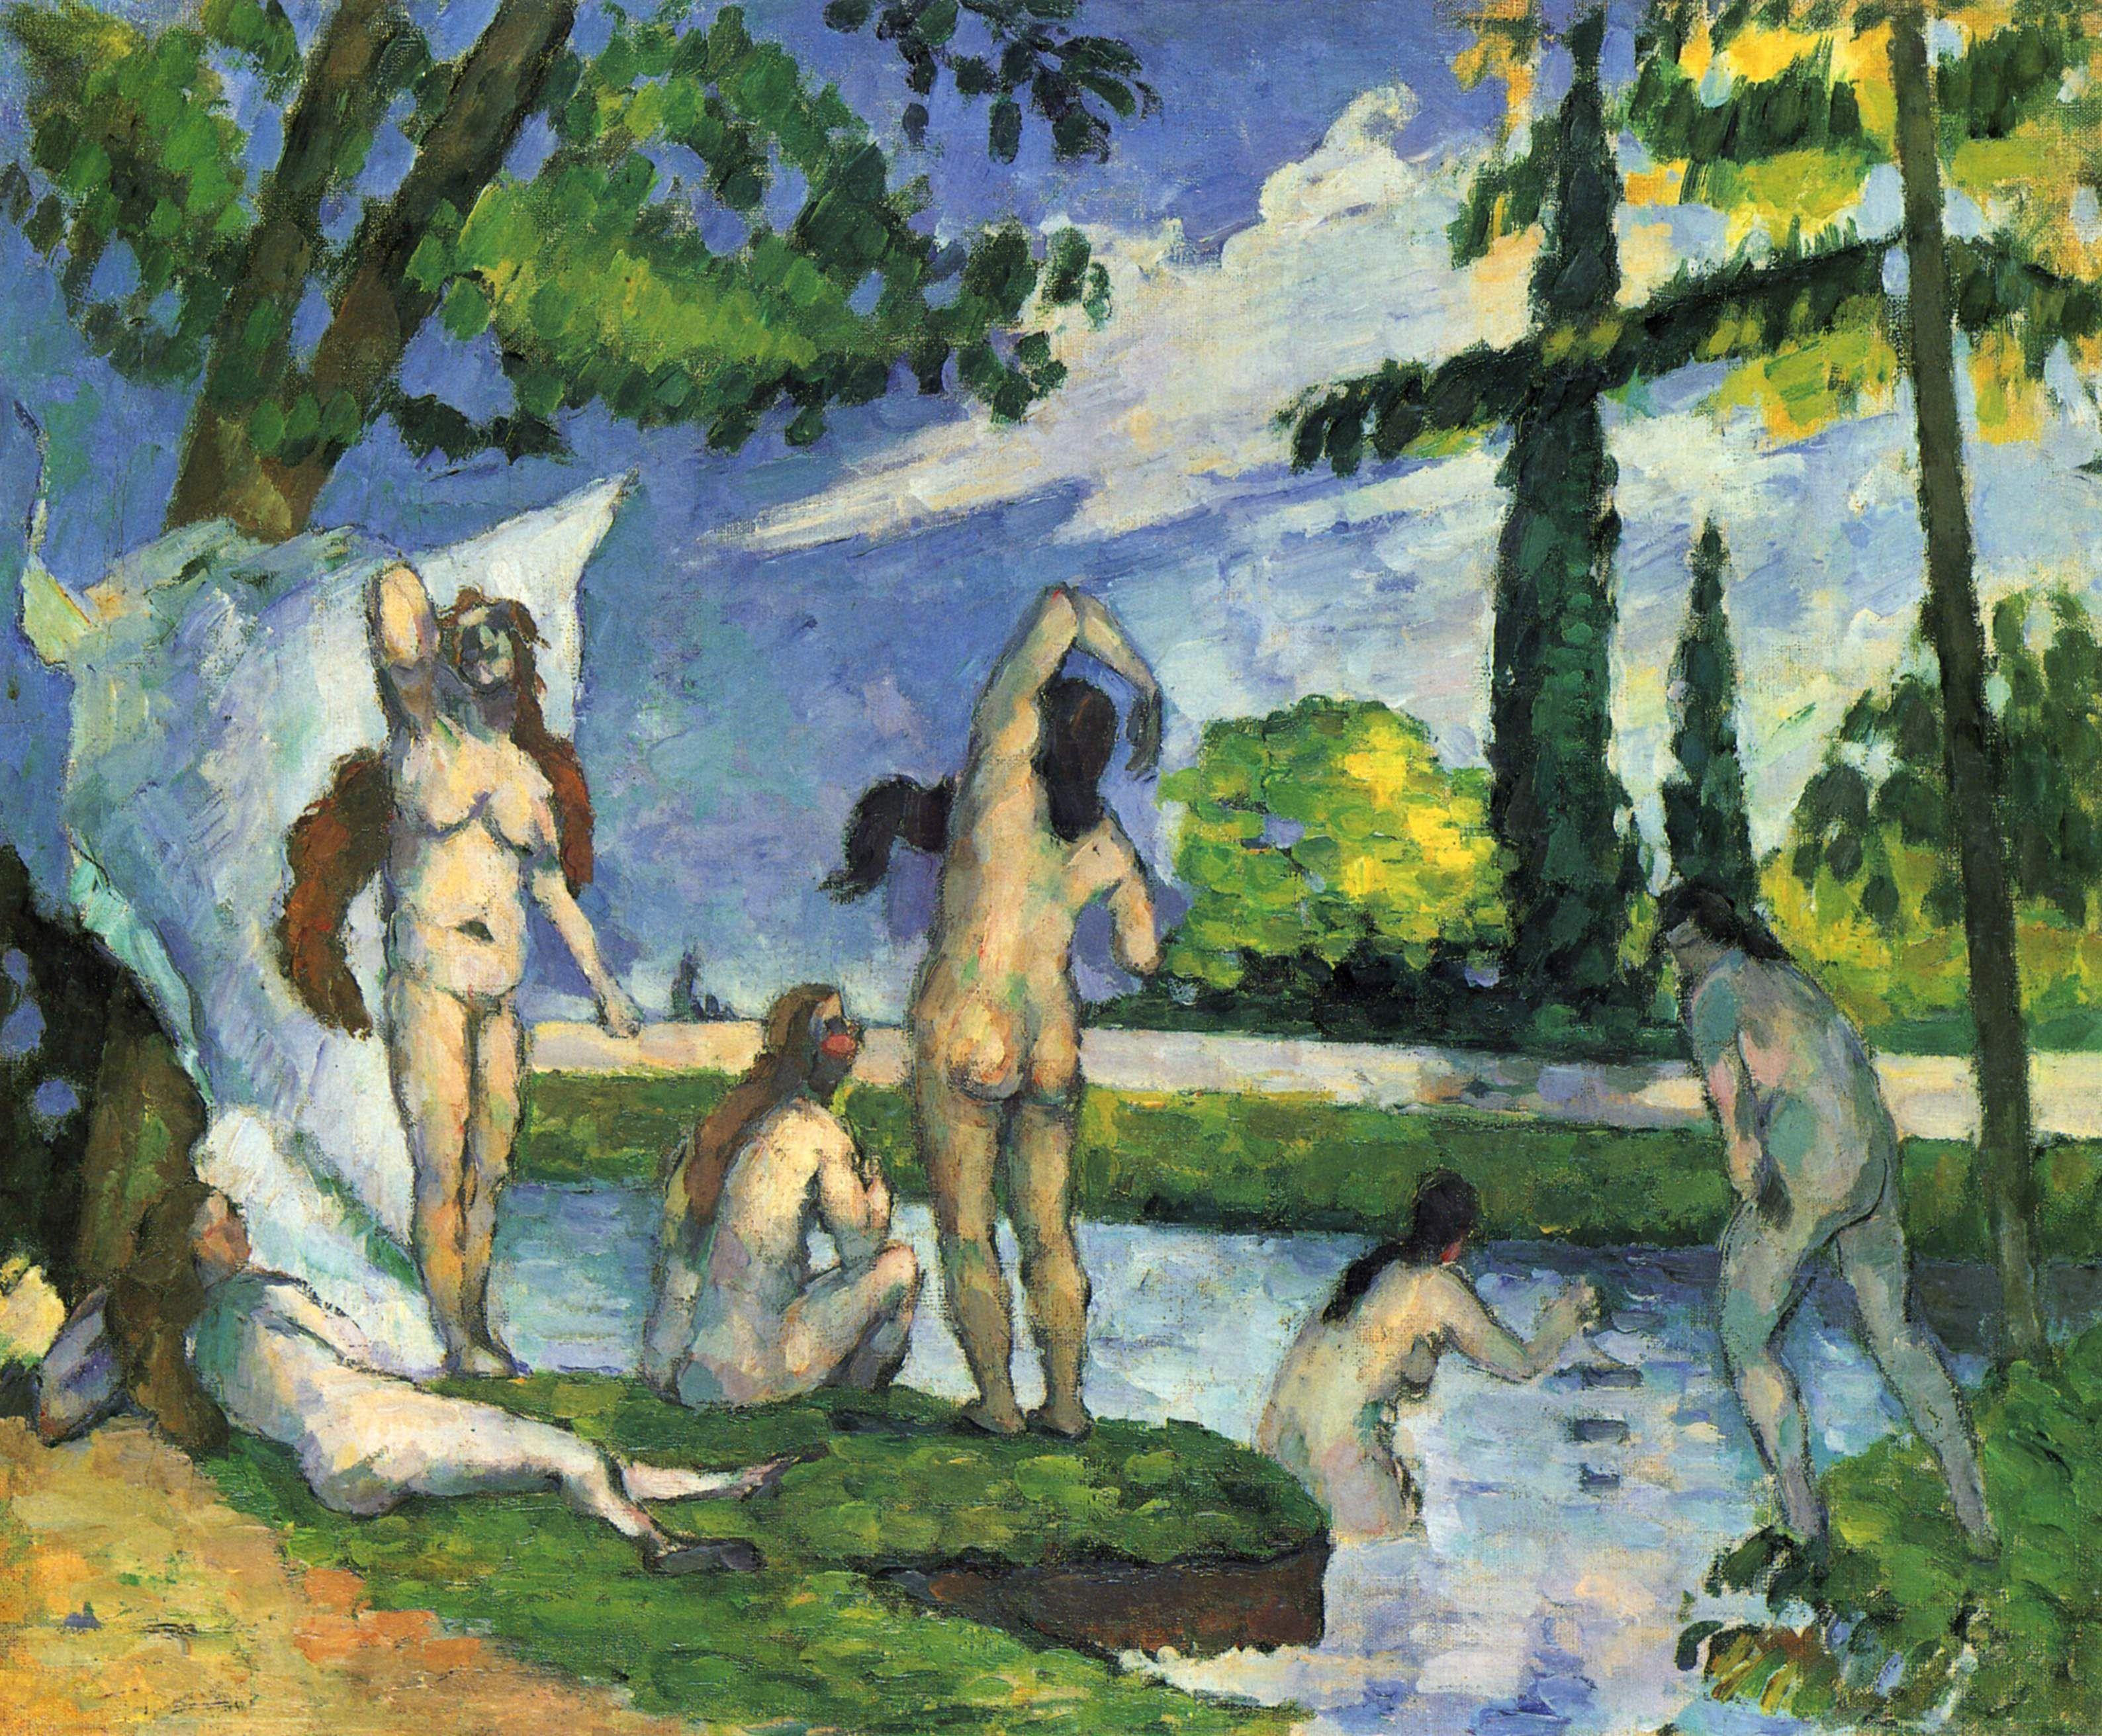 Paul_Cézanne_004.jpg 3176×2623 pikseli